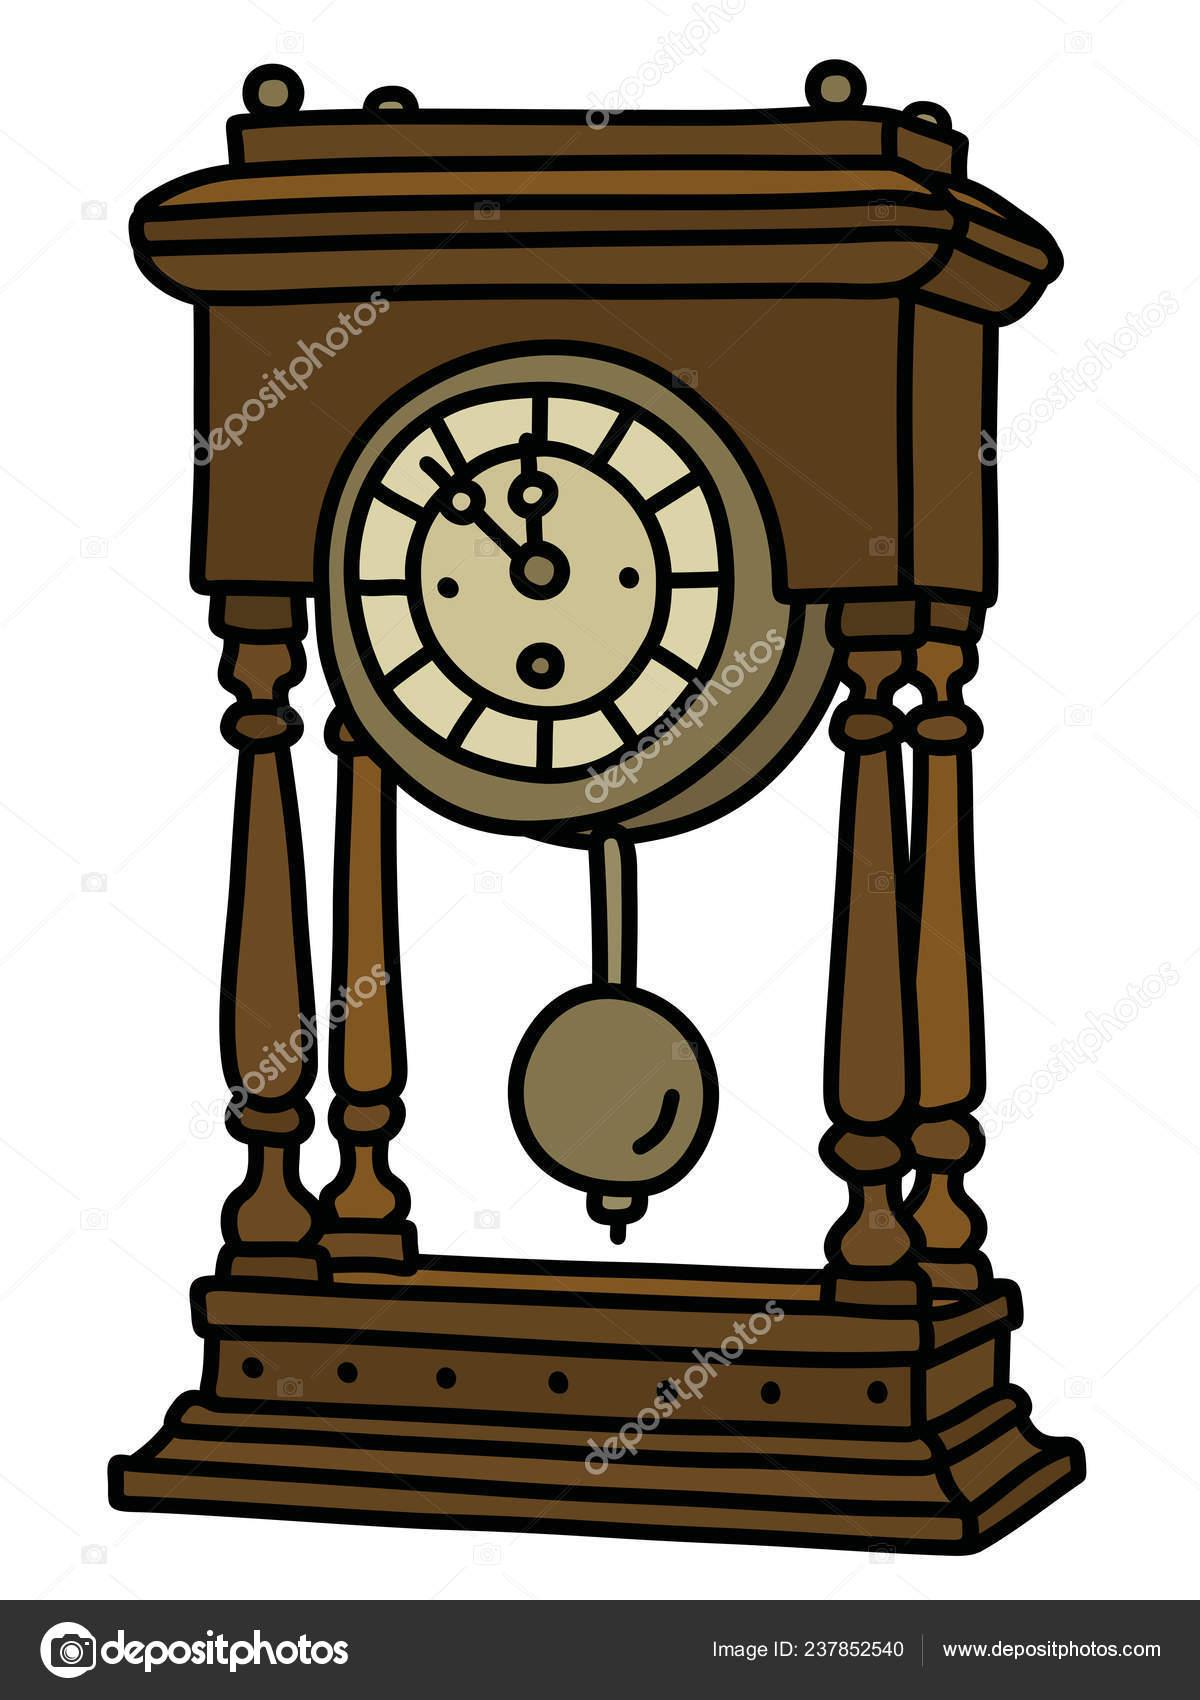 Vectorized Hand Drawing Retro Desktop Pendulum Clock — Stock